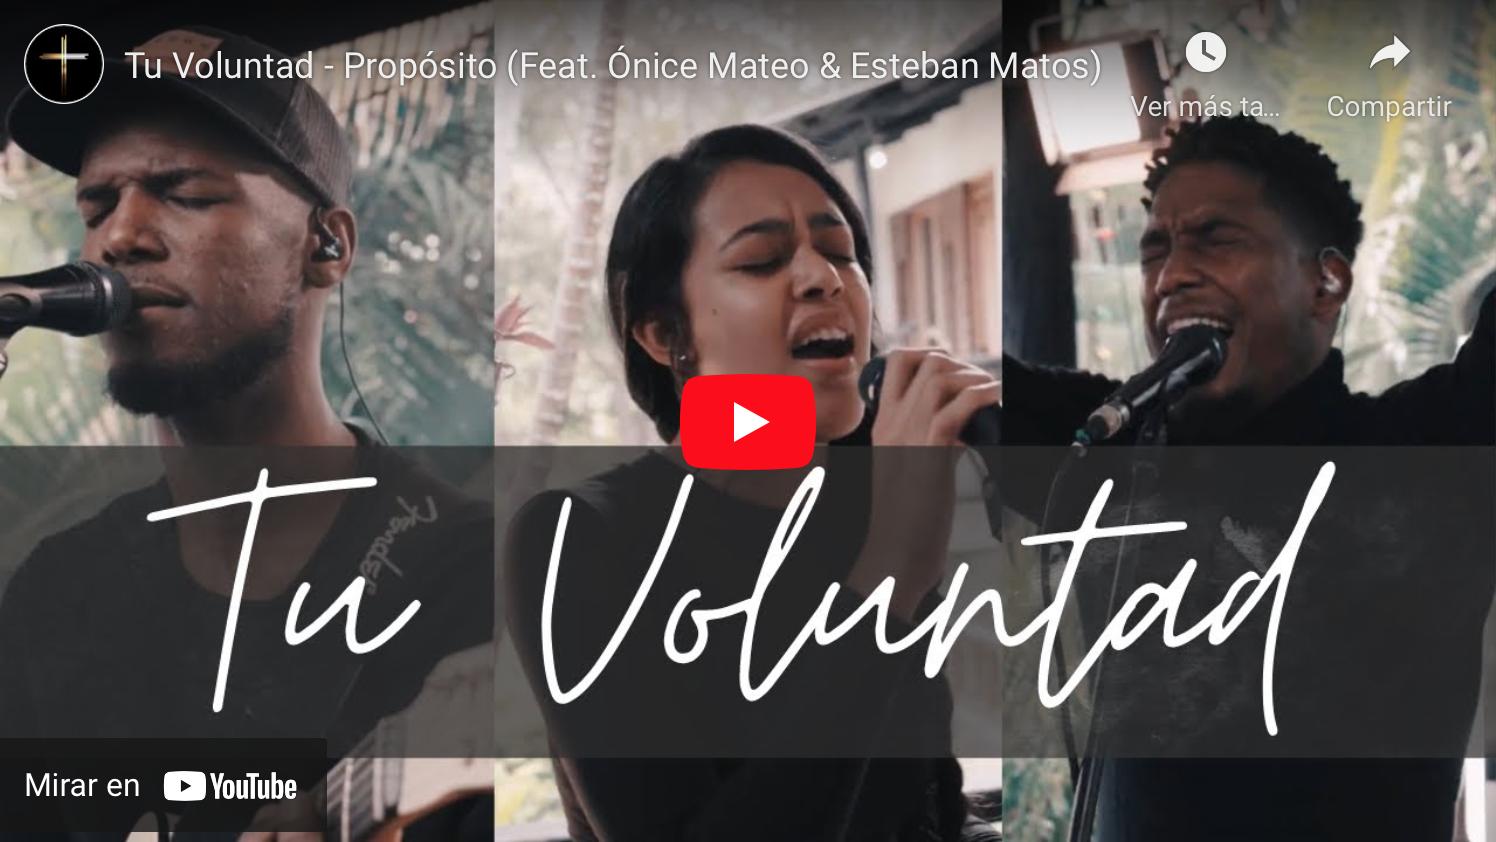 Tu Voluntad - Propósito (Feat. Ónice Mateo & Esteban Matos)